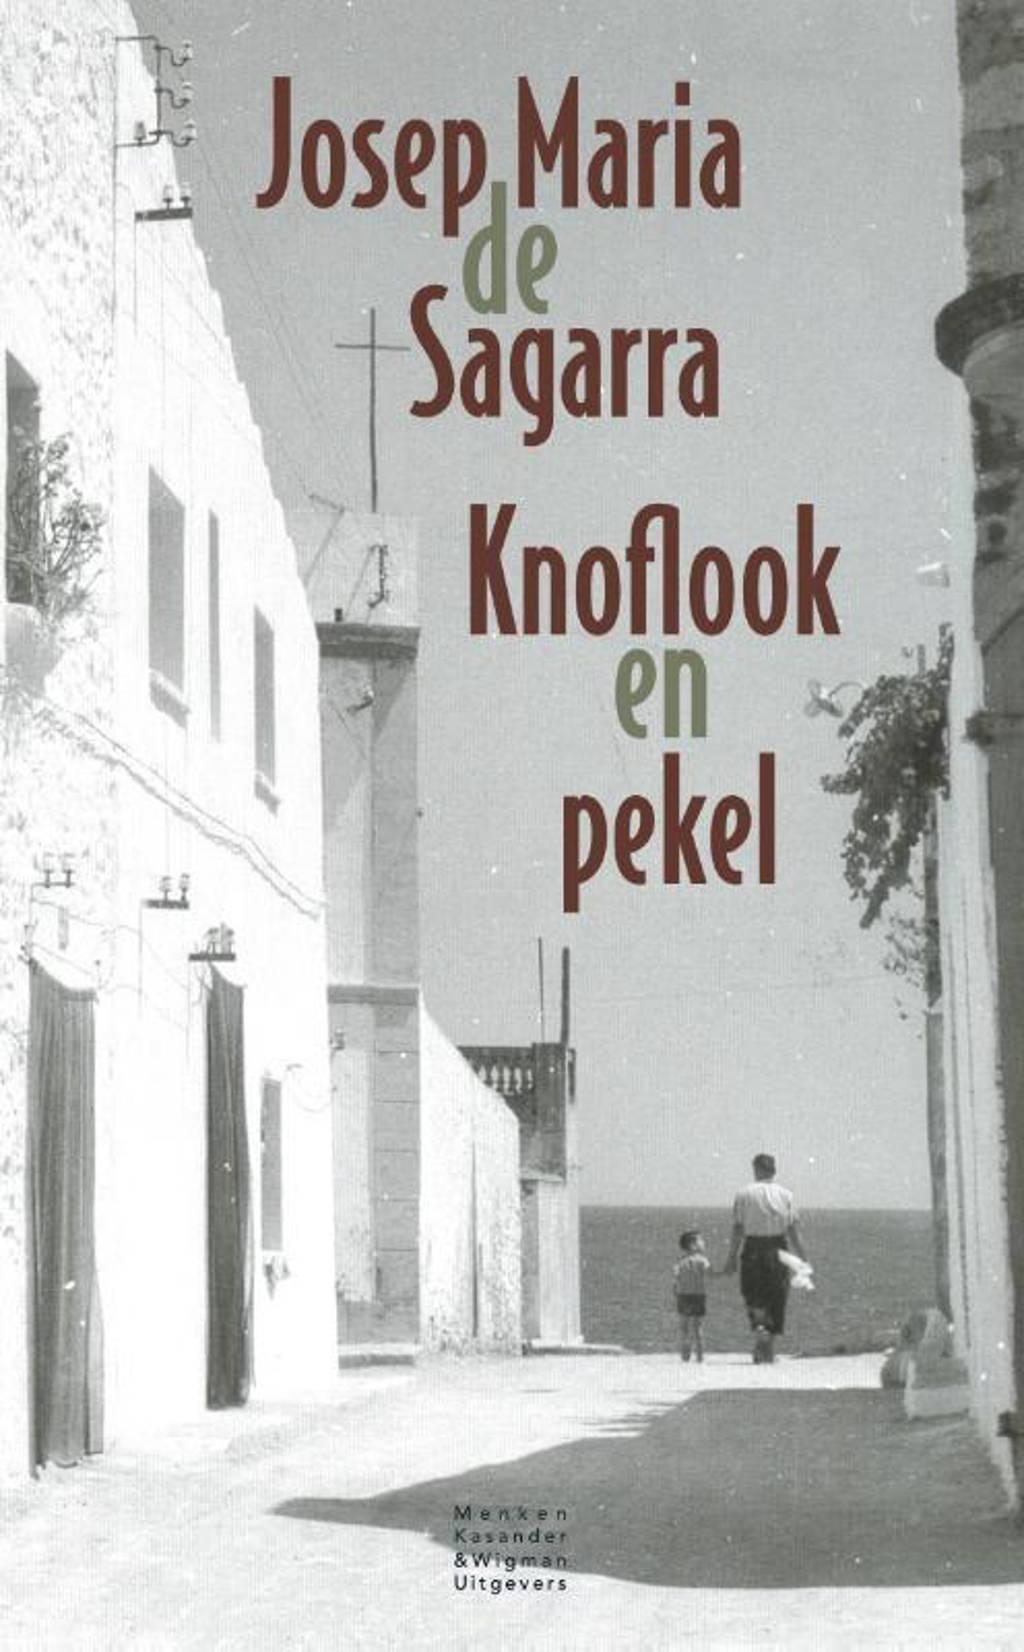 Knoflook en pekel - Josep Maria de Sagarra